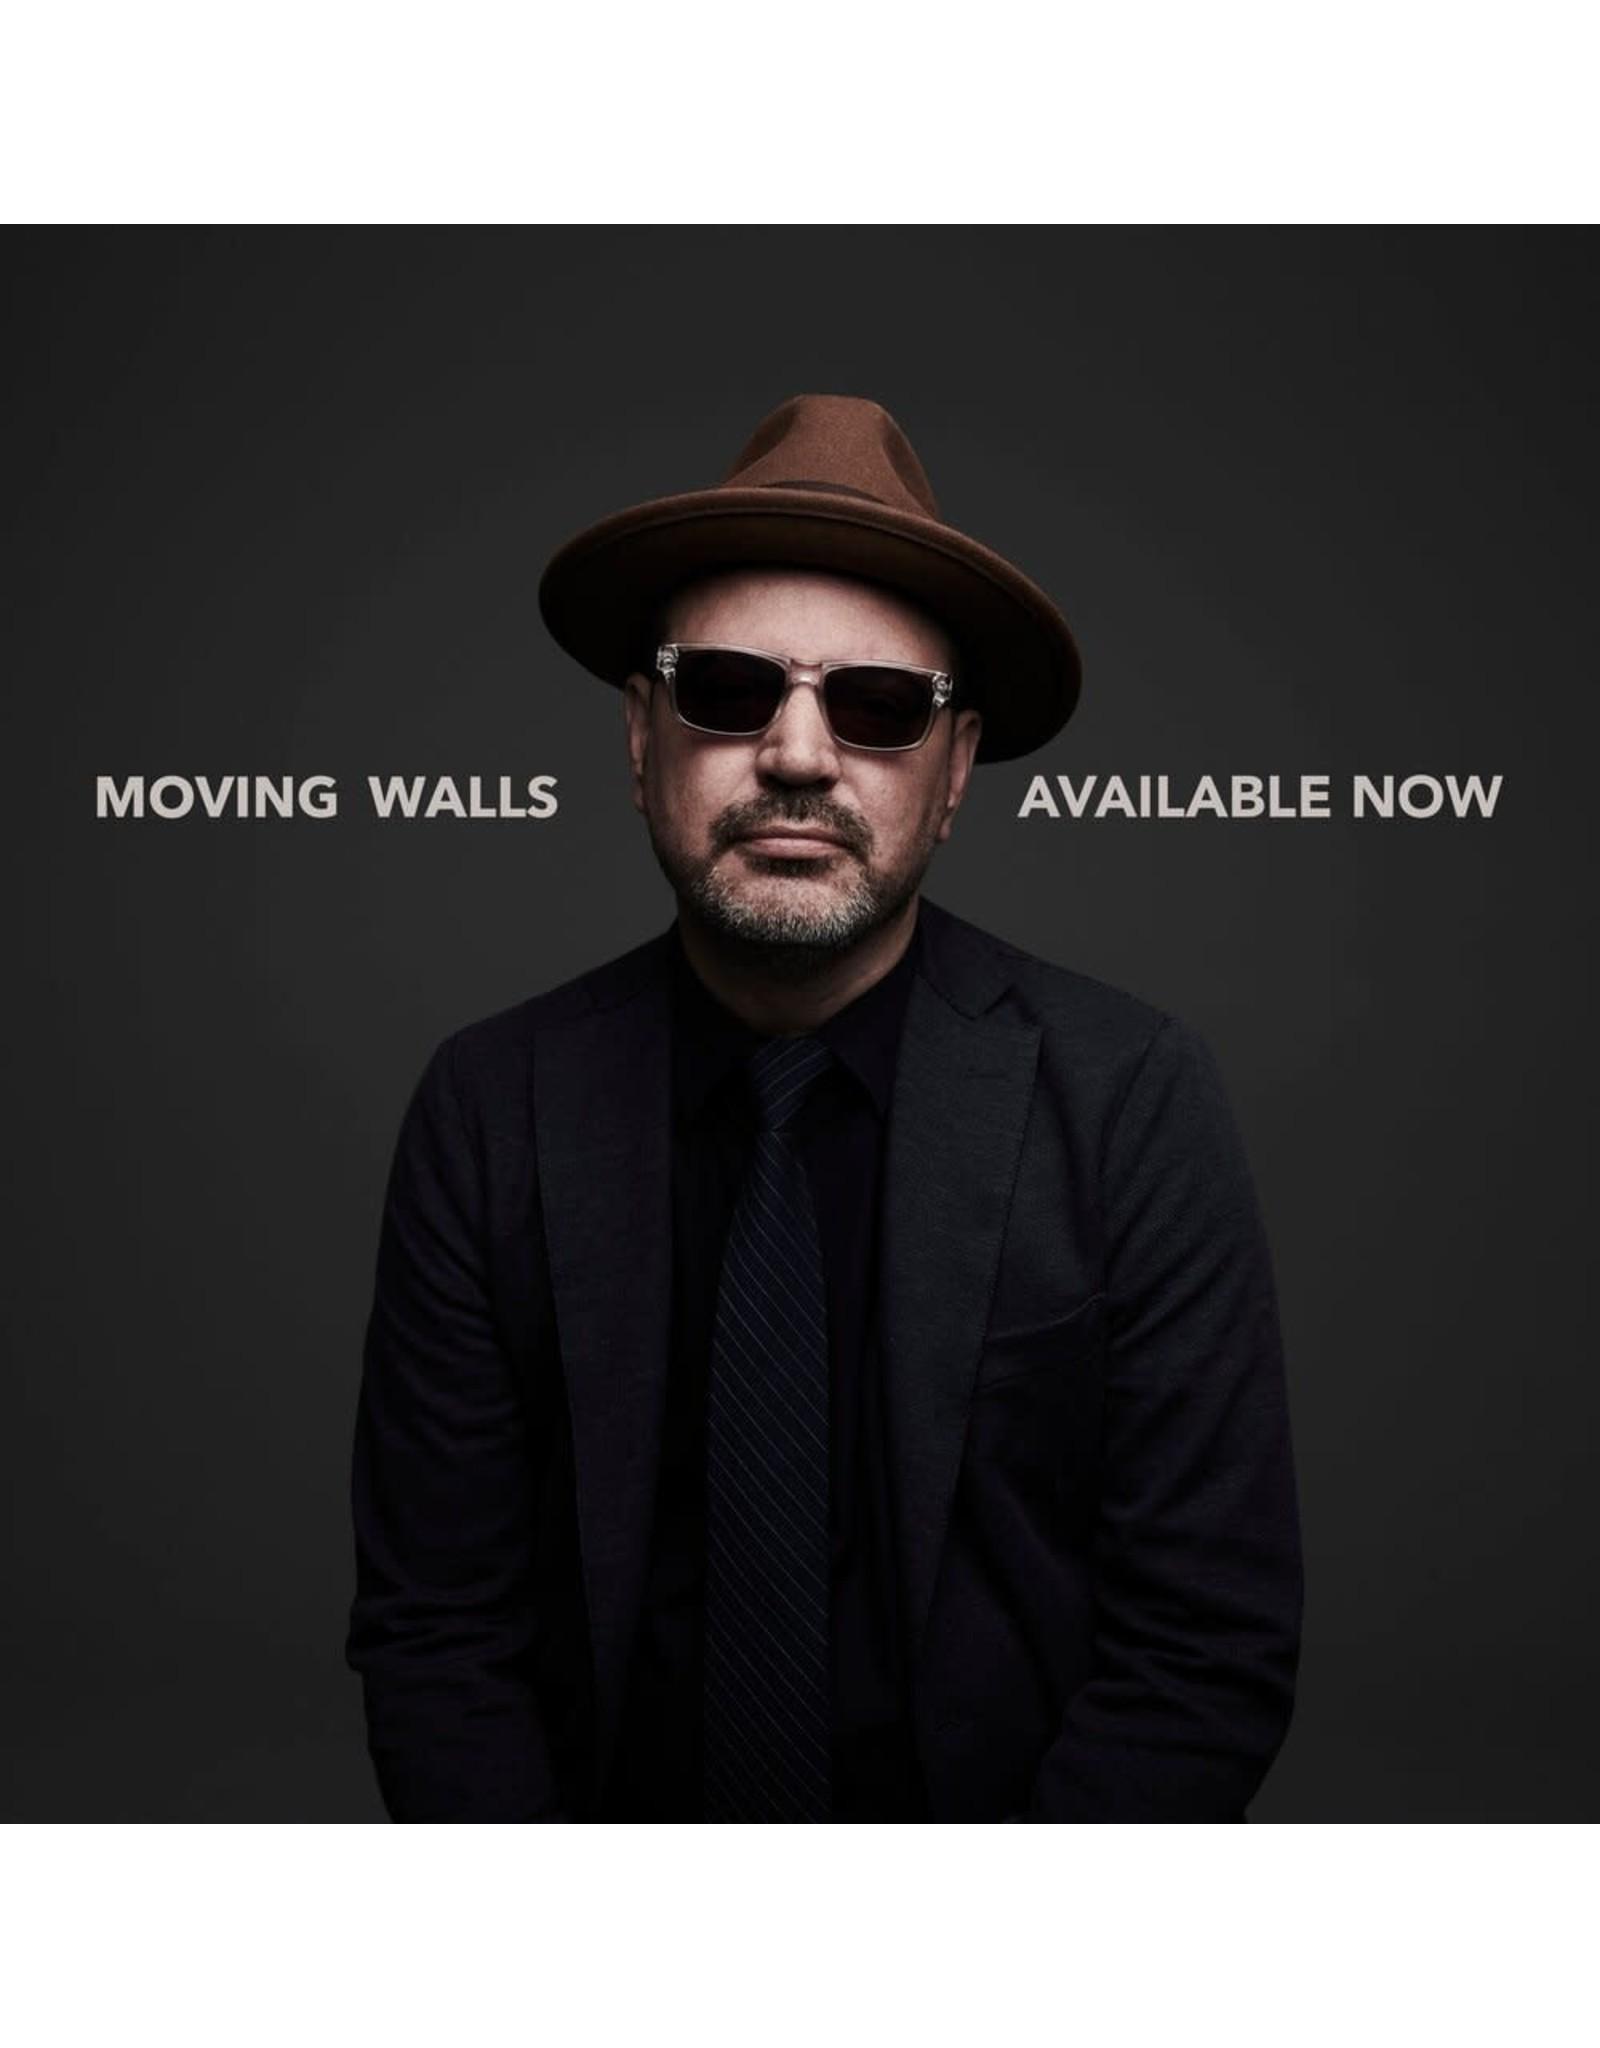 Good, Matthew - Moving Walls CD